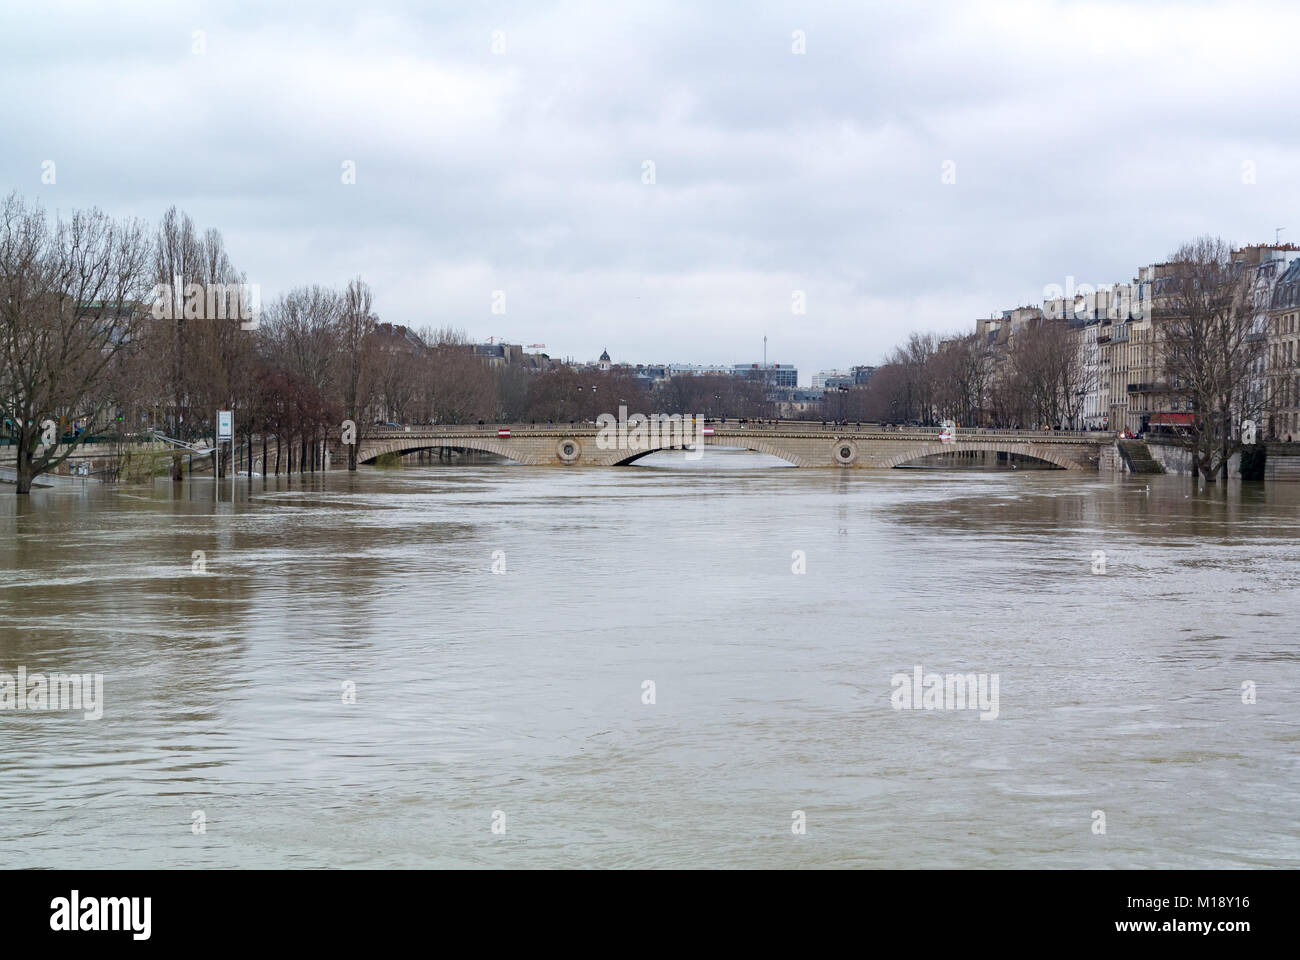 Flooding on Seine river Paris France - Stock Image